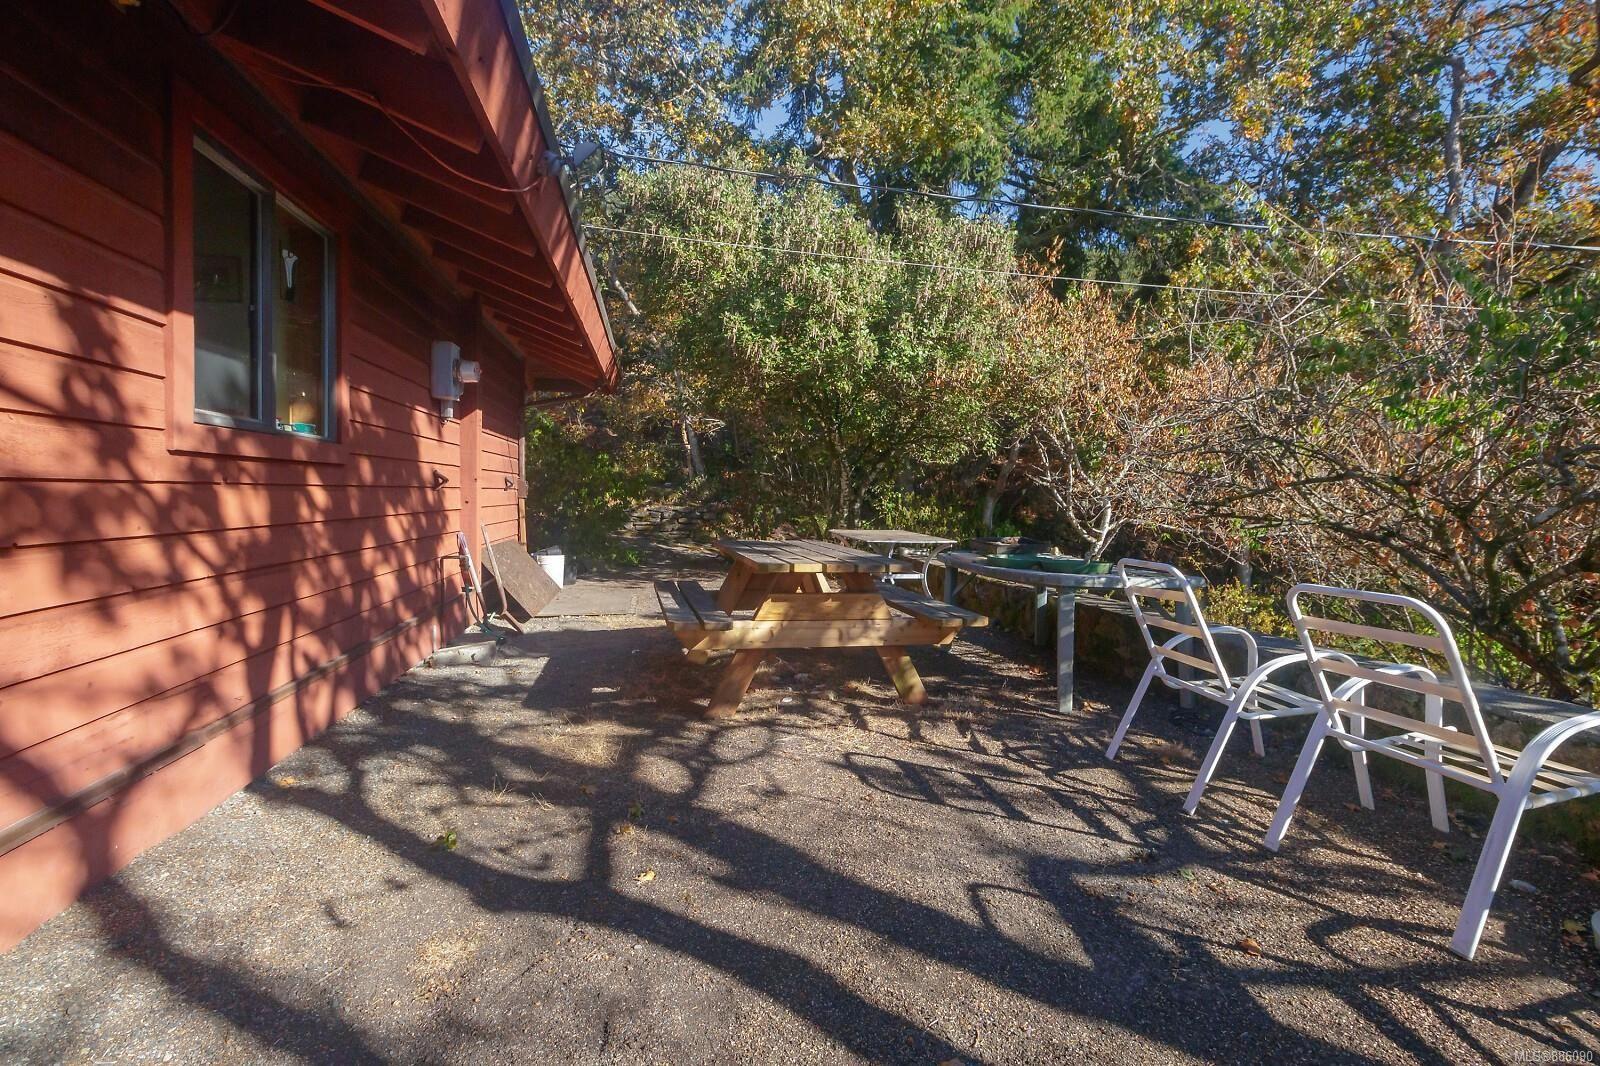 Photo 28: Photos: 4553 Blenkinsop Rd in : SE Blenkinsop House for sale (Saanich East)  : MLS®# 886090